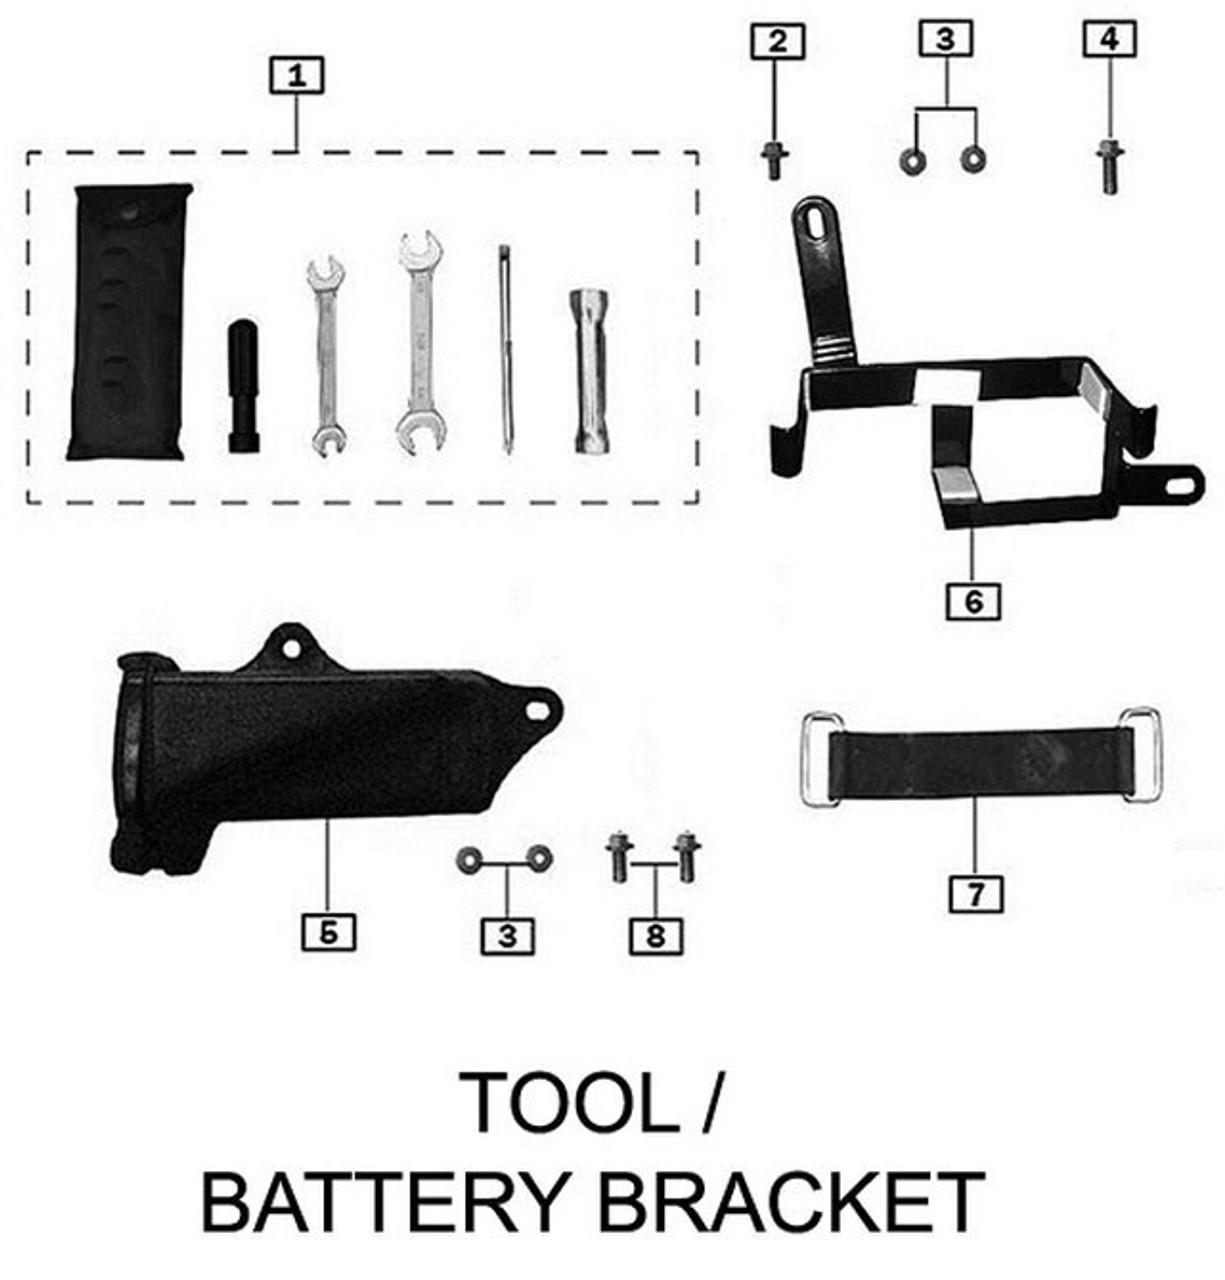 TOOL / BATTERY BRACKET